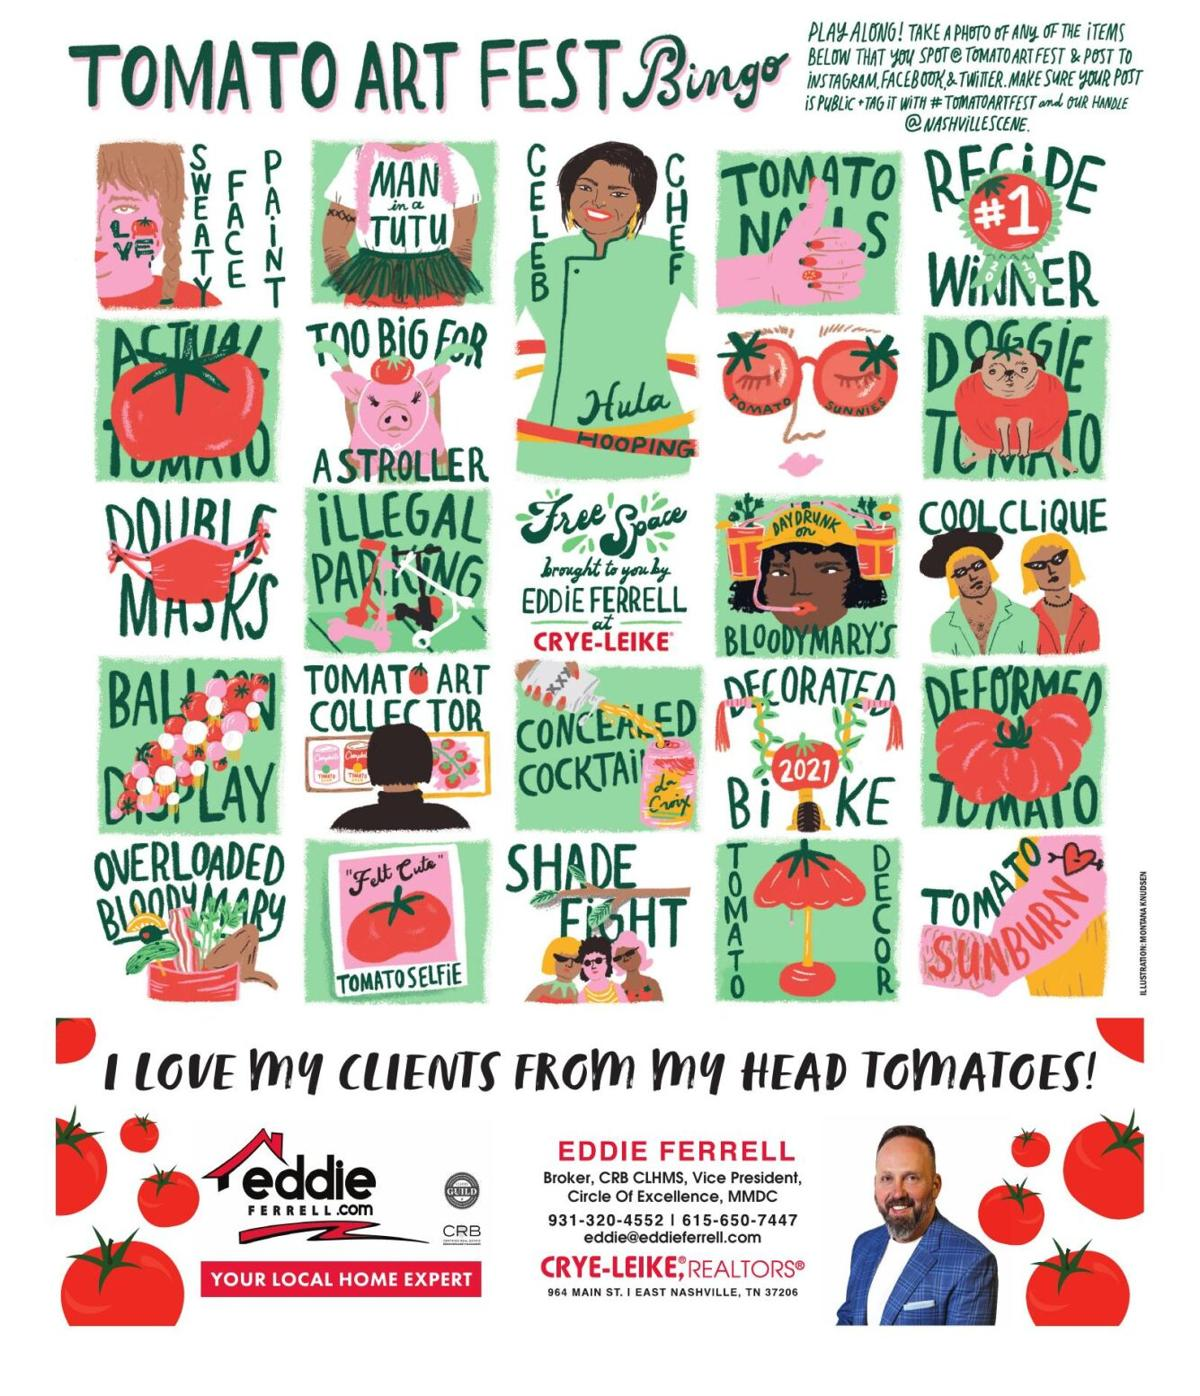 Tomato Art Fest Bingo 2021